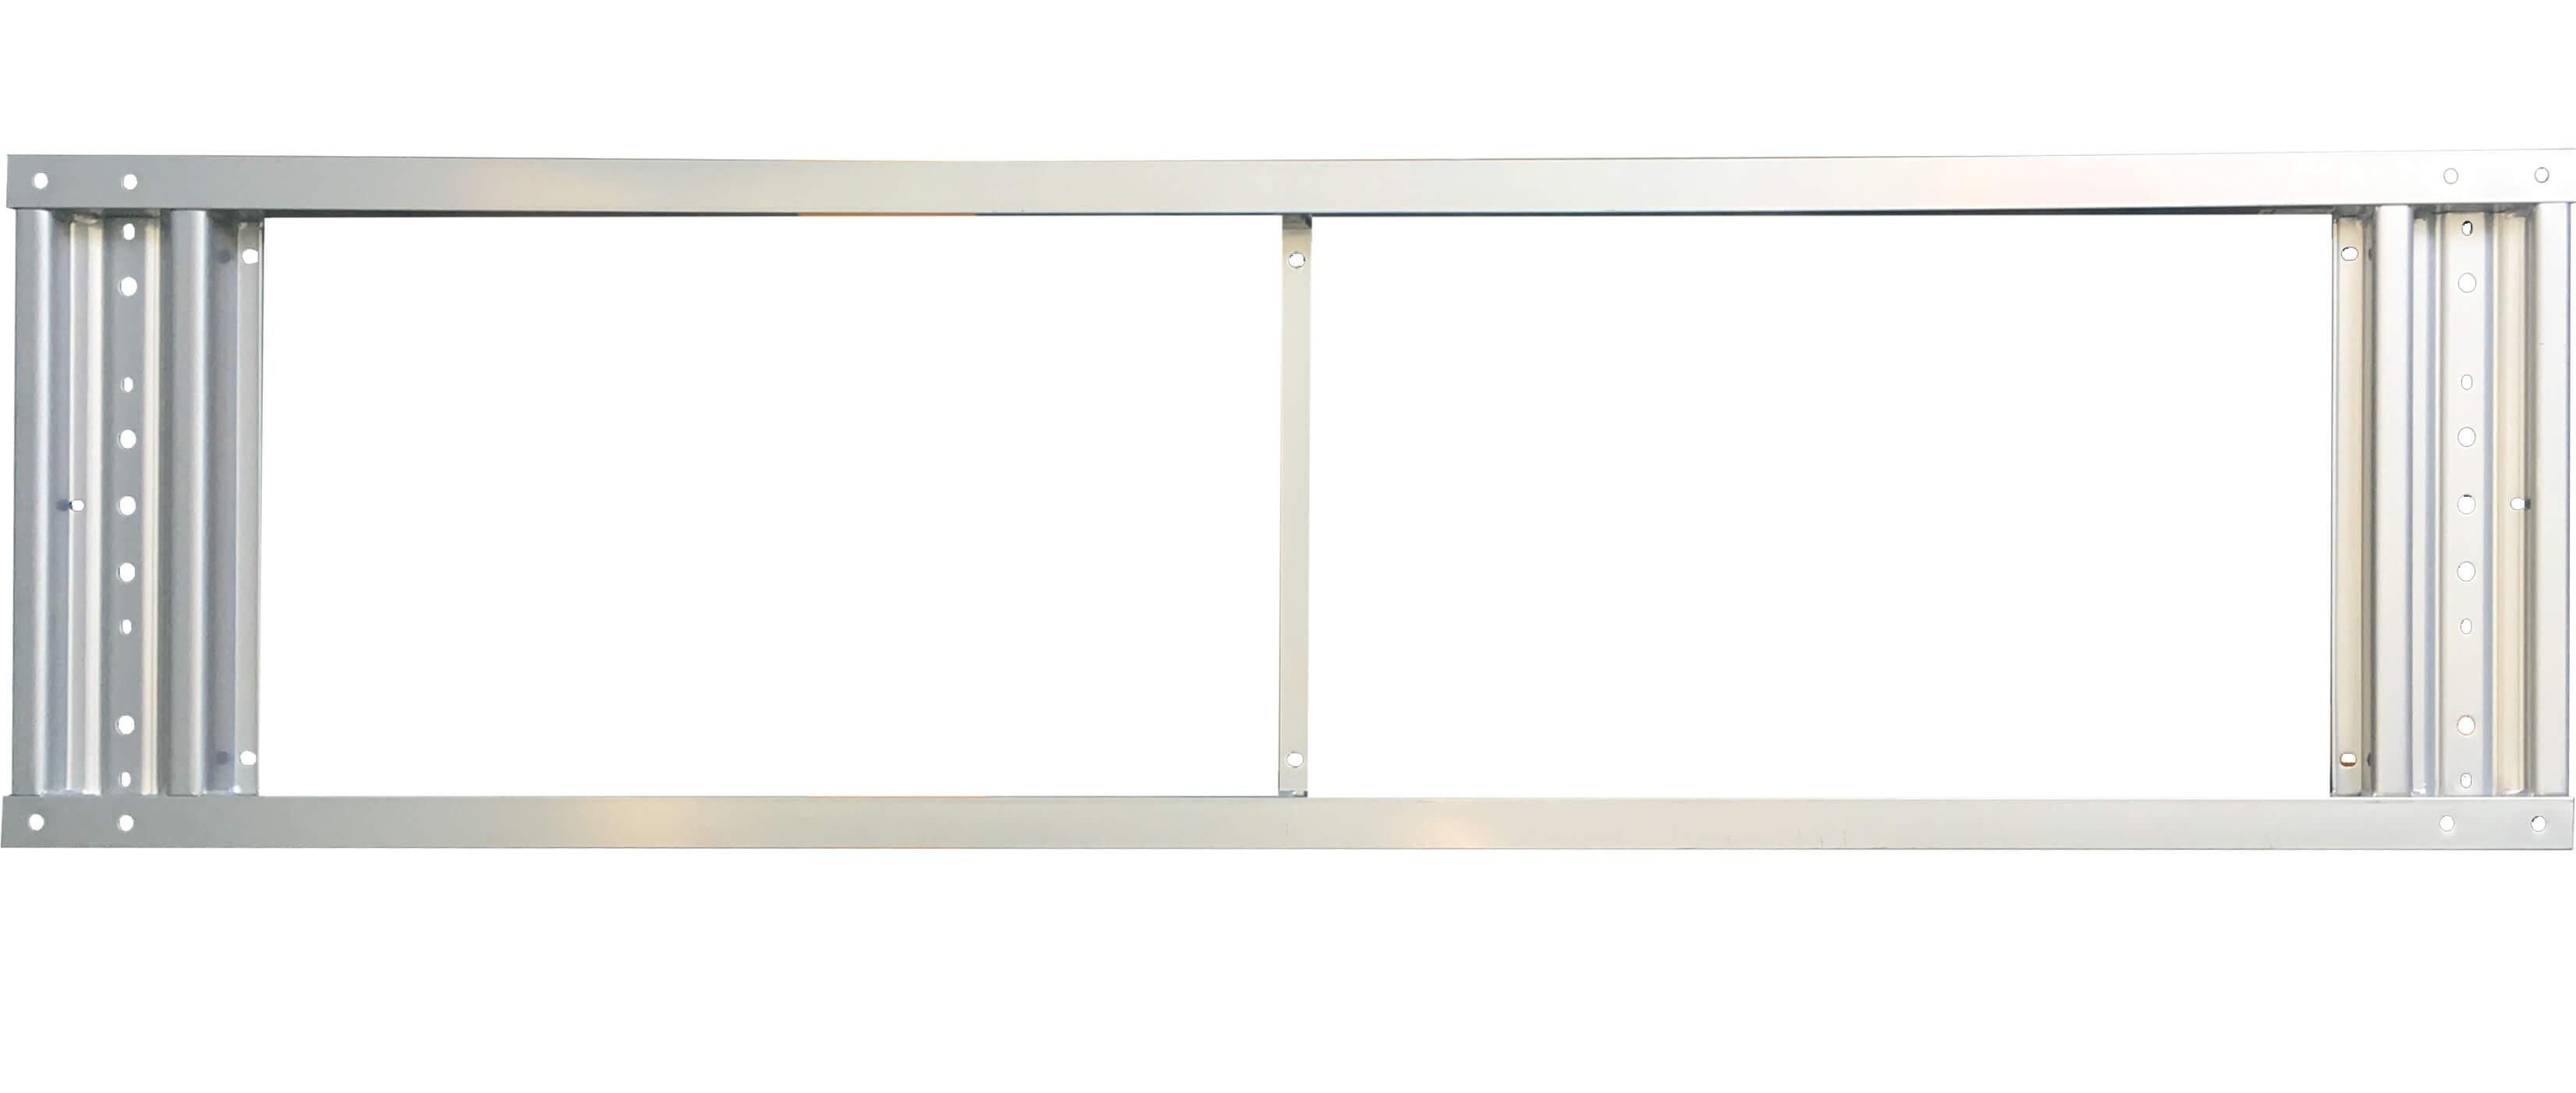 ikea galant rahmen f r tischplatten 120cm. Black Bedroom Furniture Sets. Home Design Ideas